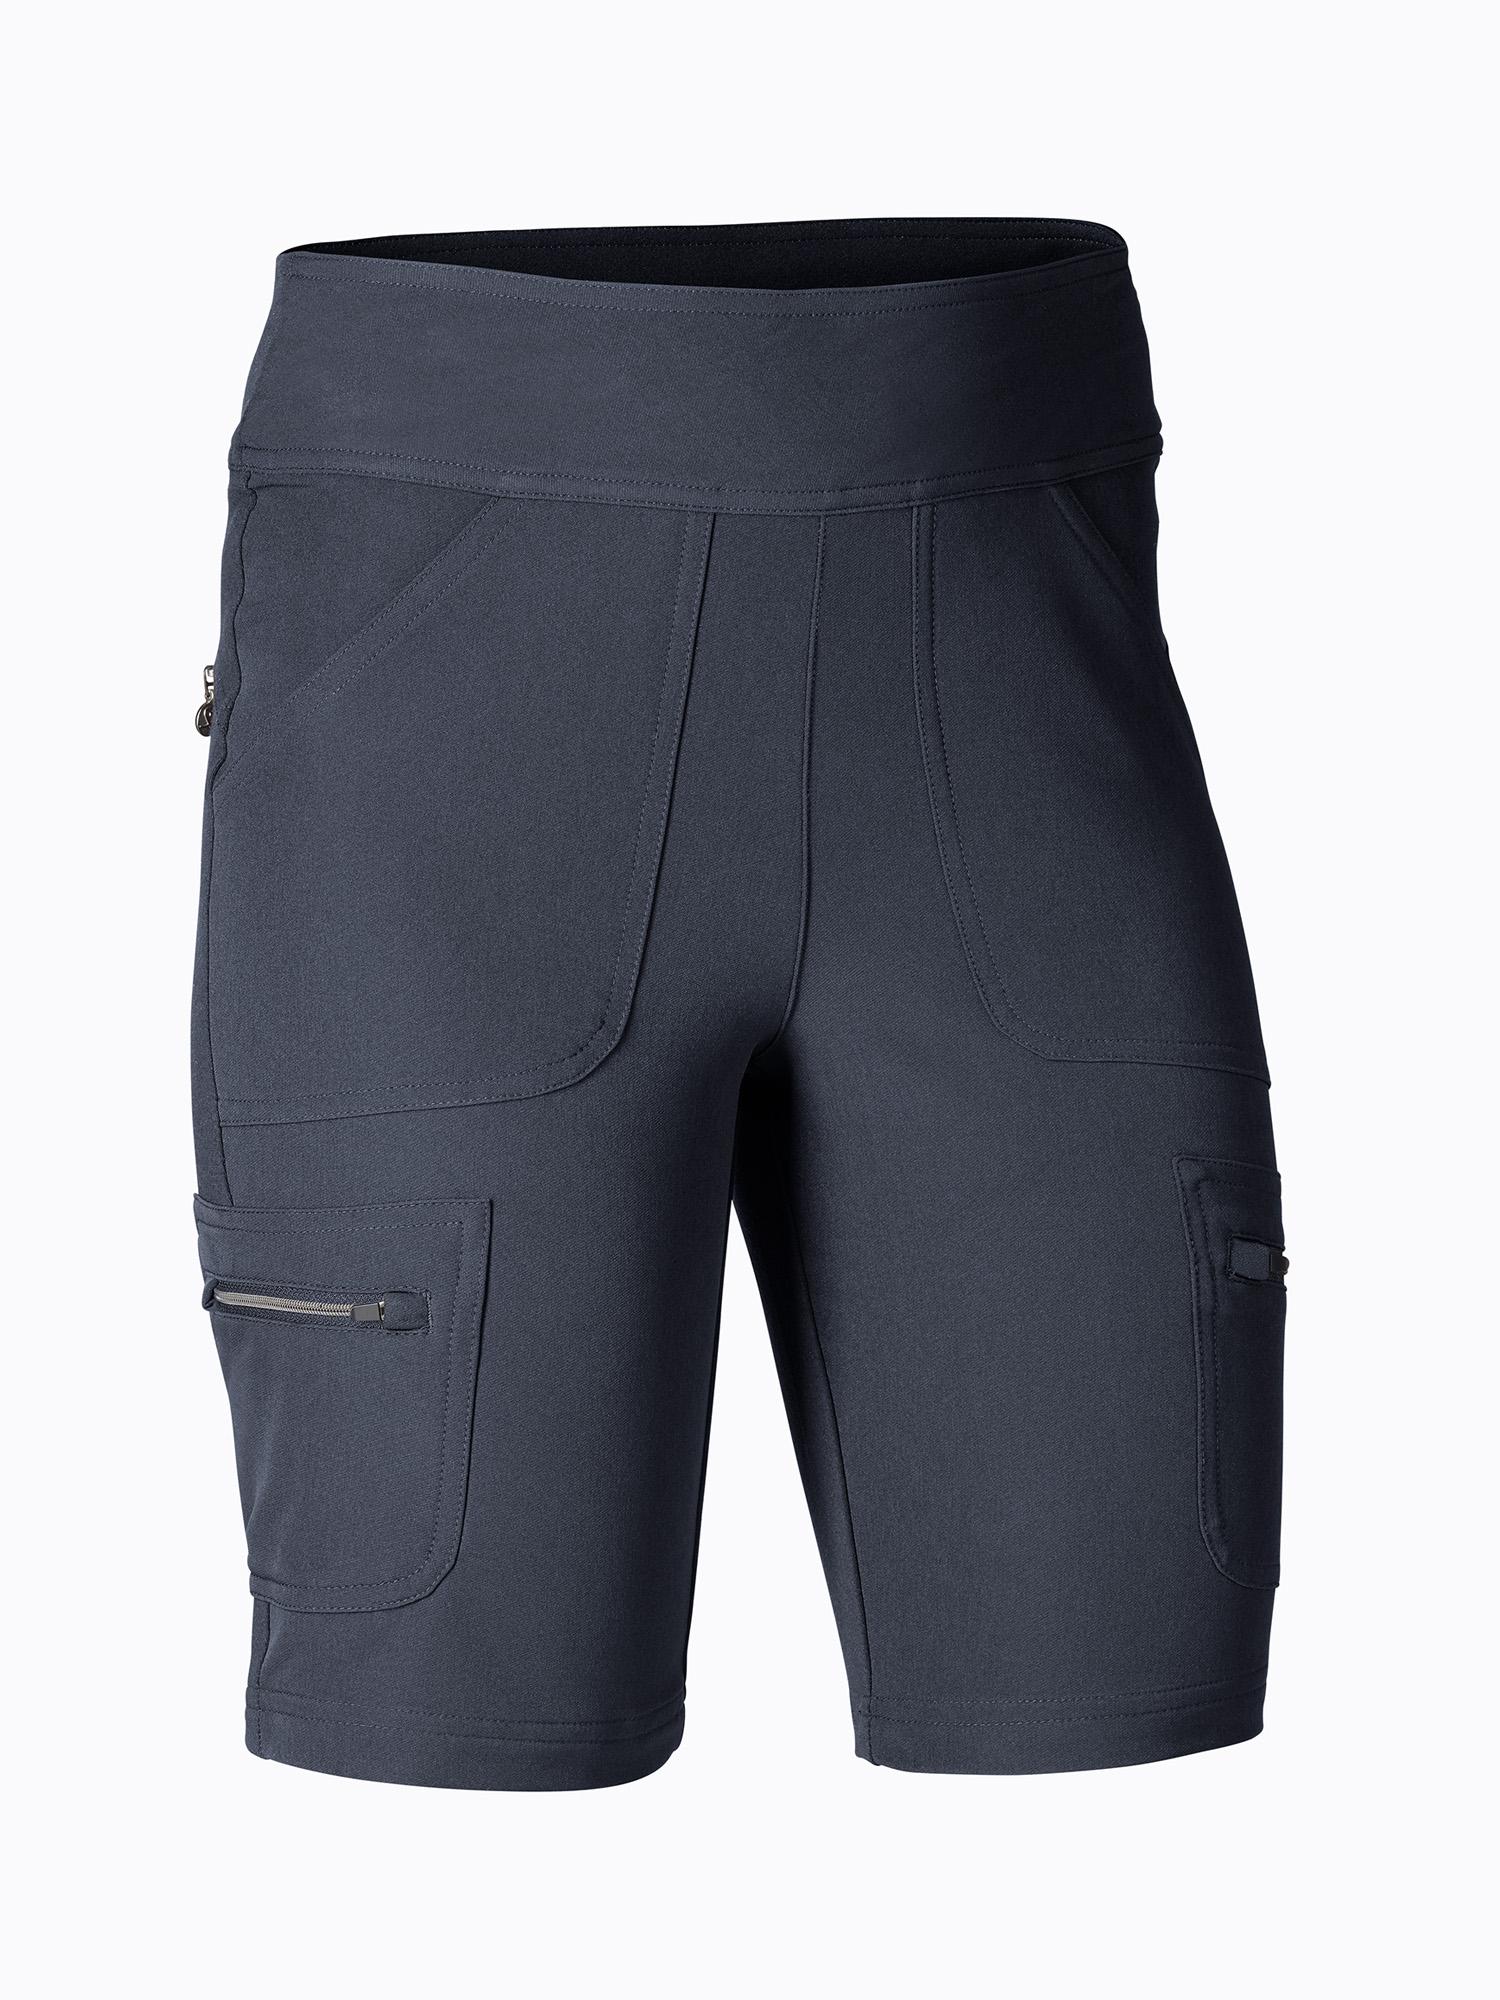 Avoriaz Outdoor Shorts